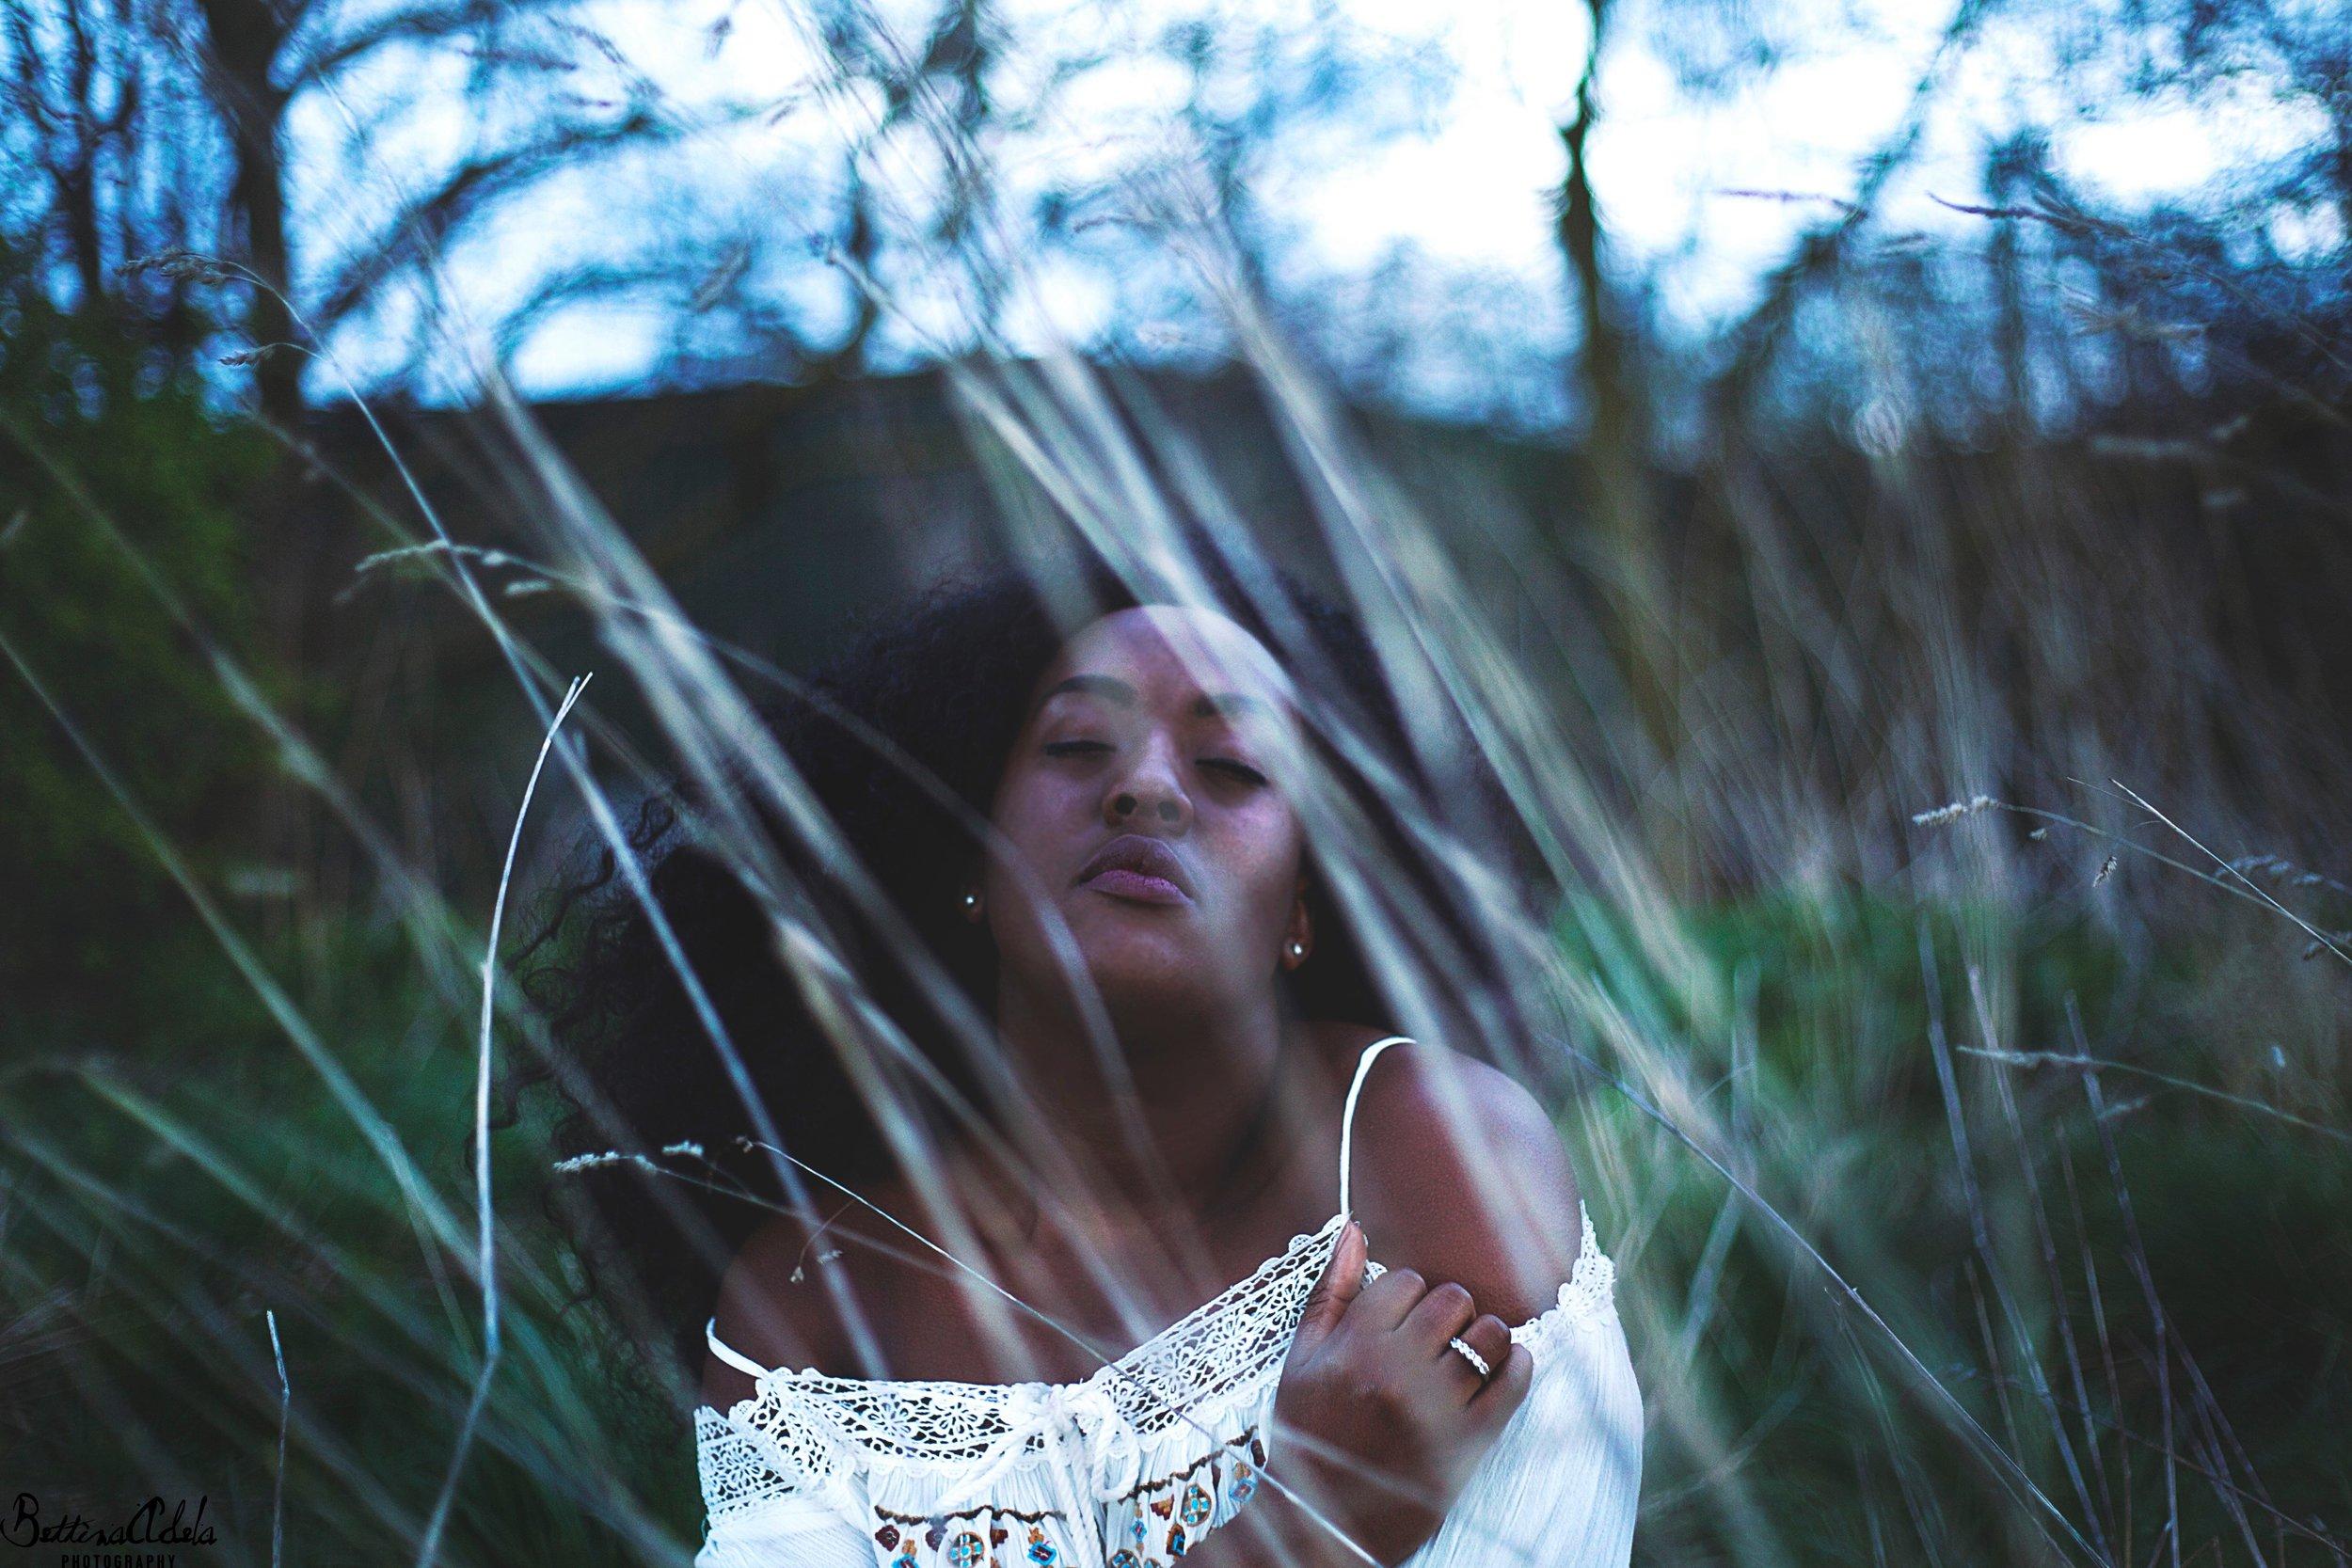 bettina-adela-semi-zine-photography-feature-submission-4.jpg